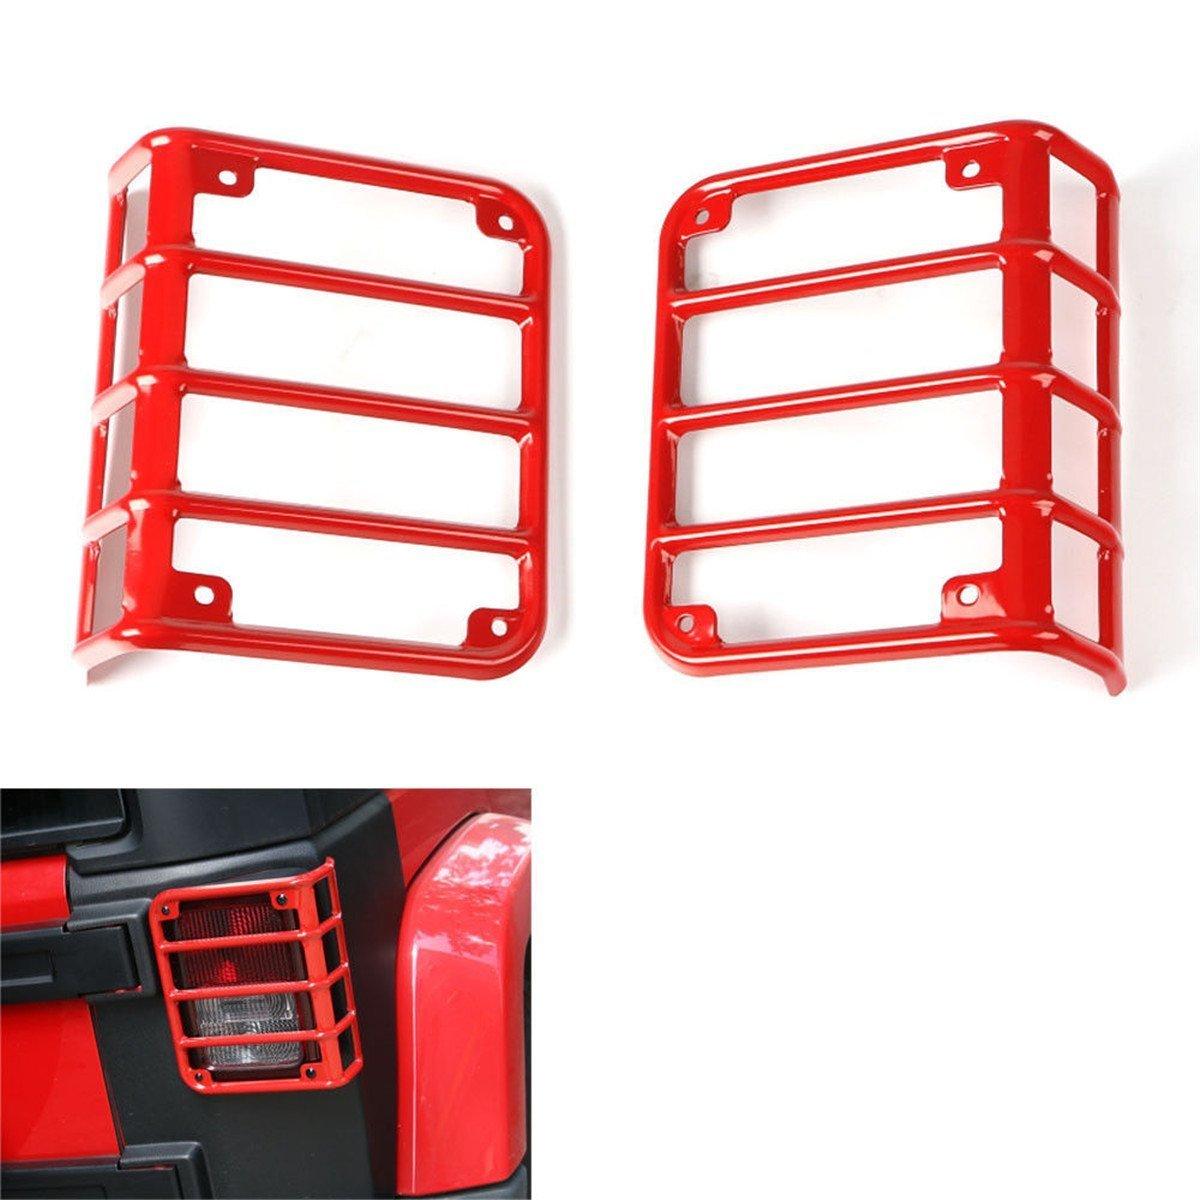 Pair 4333008581 Hooke Road Red Rear Tail Light Cover for 2007-2018 Jeep Wrangler /& Wrangler Unlimited JK